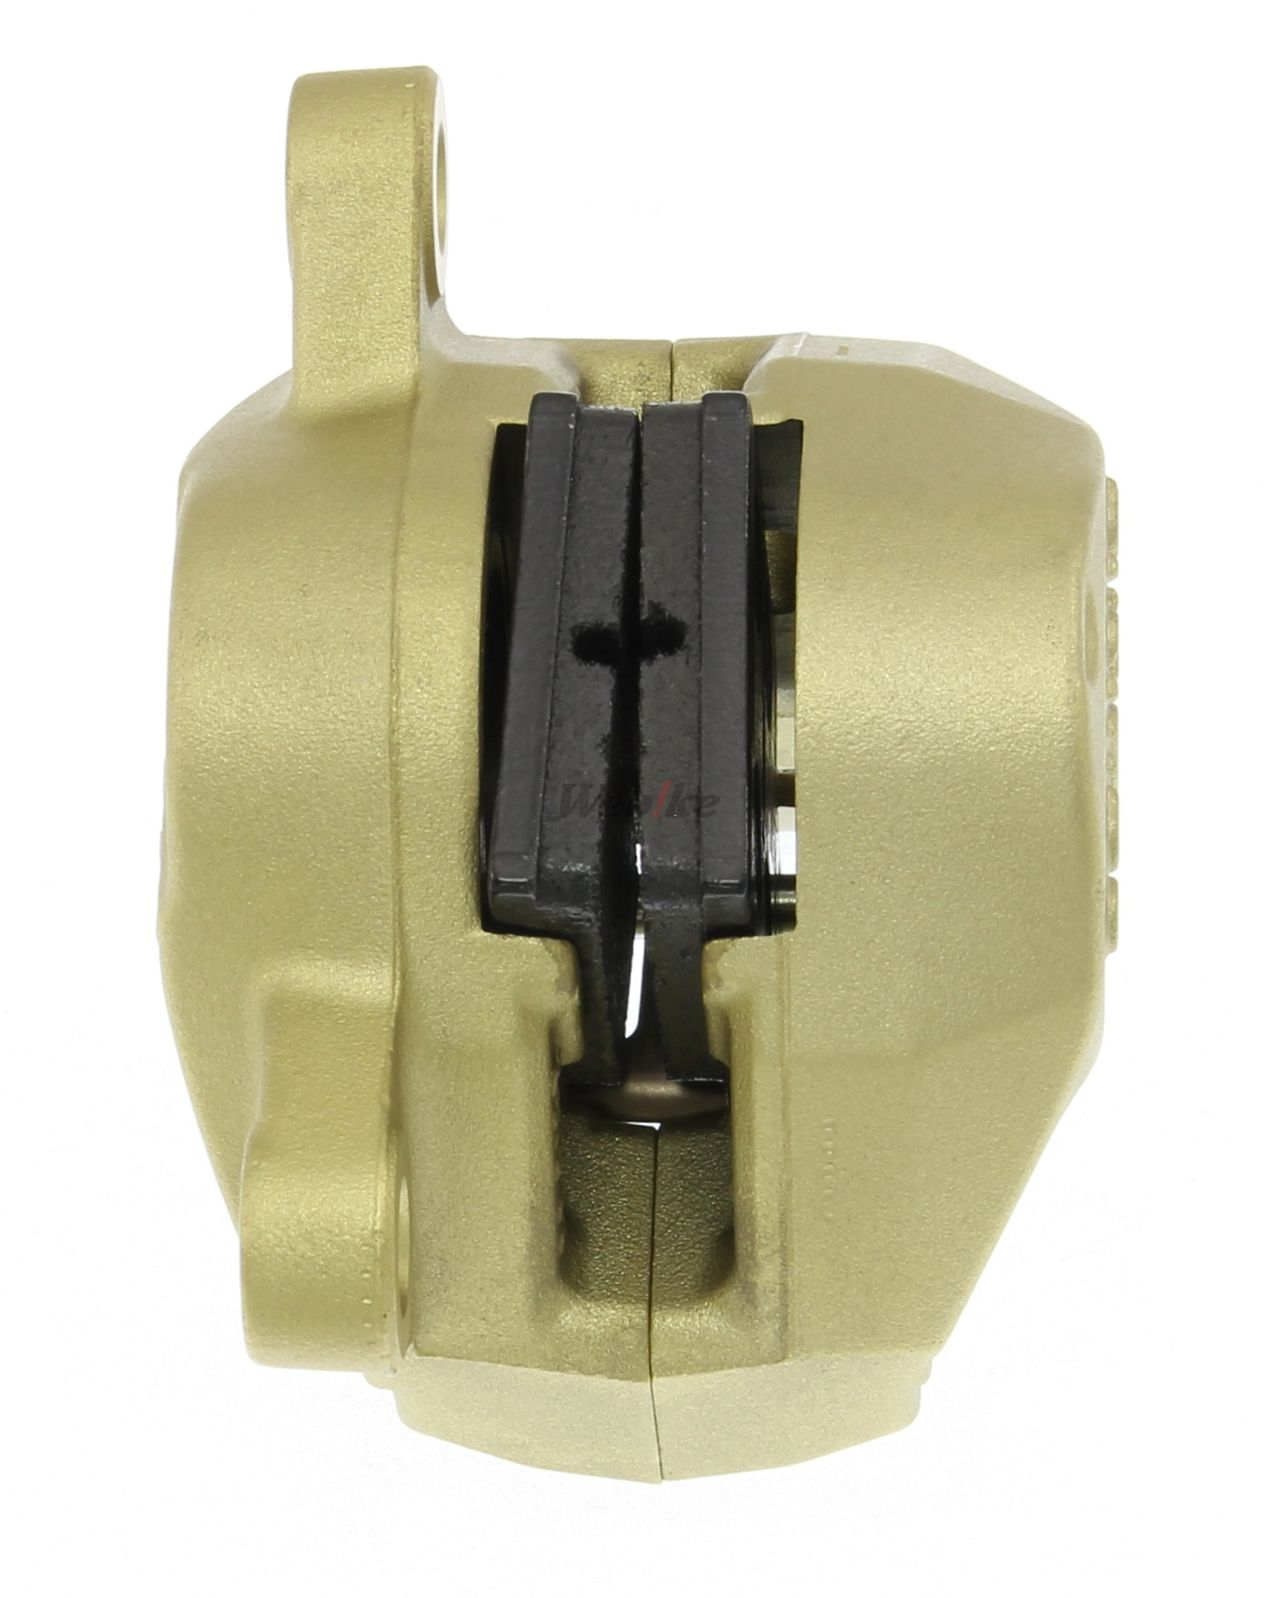 【brembo】2POT 鑄造煞車卡鉗 活塞32mm (舊螃蟹卡鉗) 【錐型螺絲規格】 - 「Webike-摩托百貨」